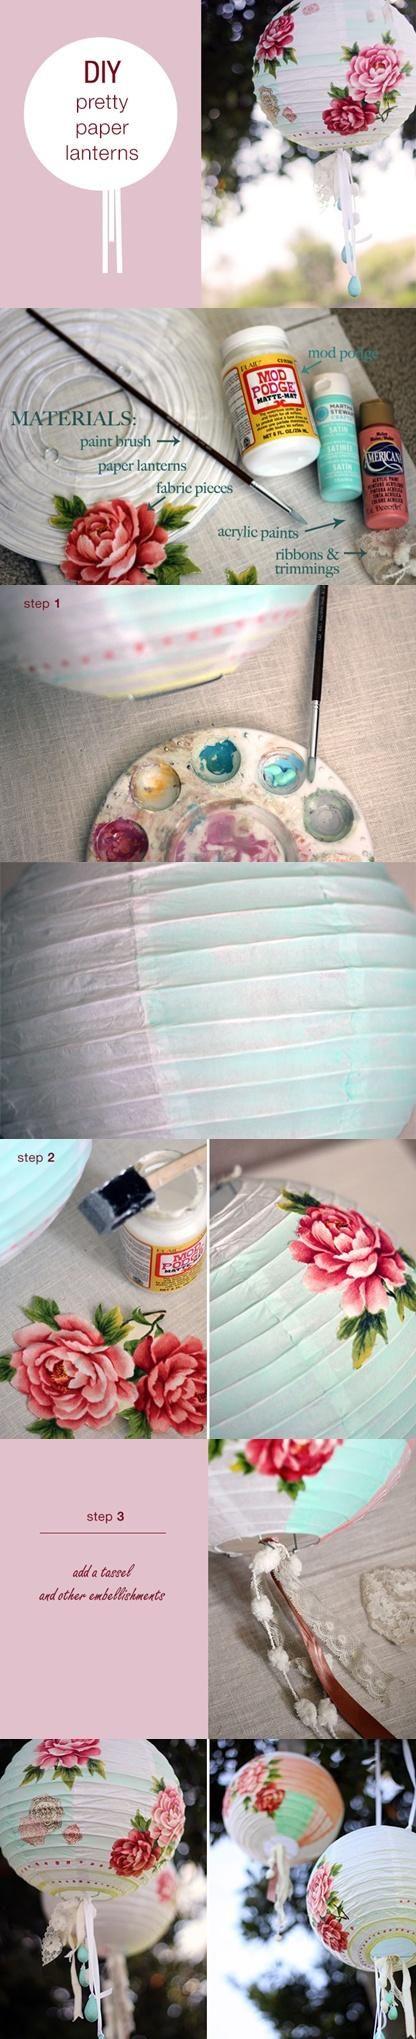 decoupage/paint on paper lanterns